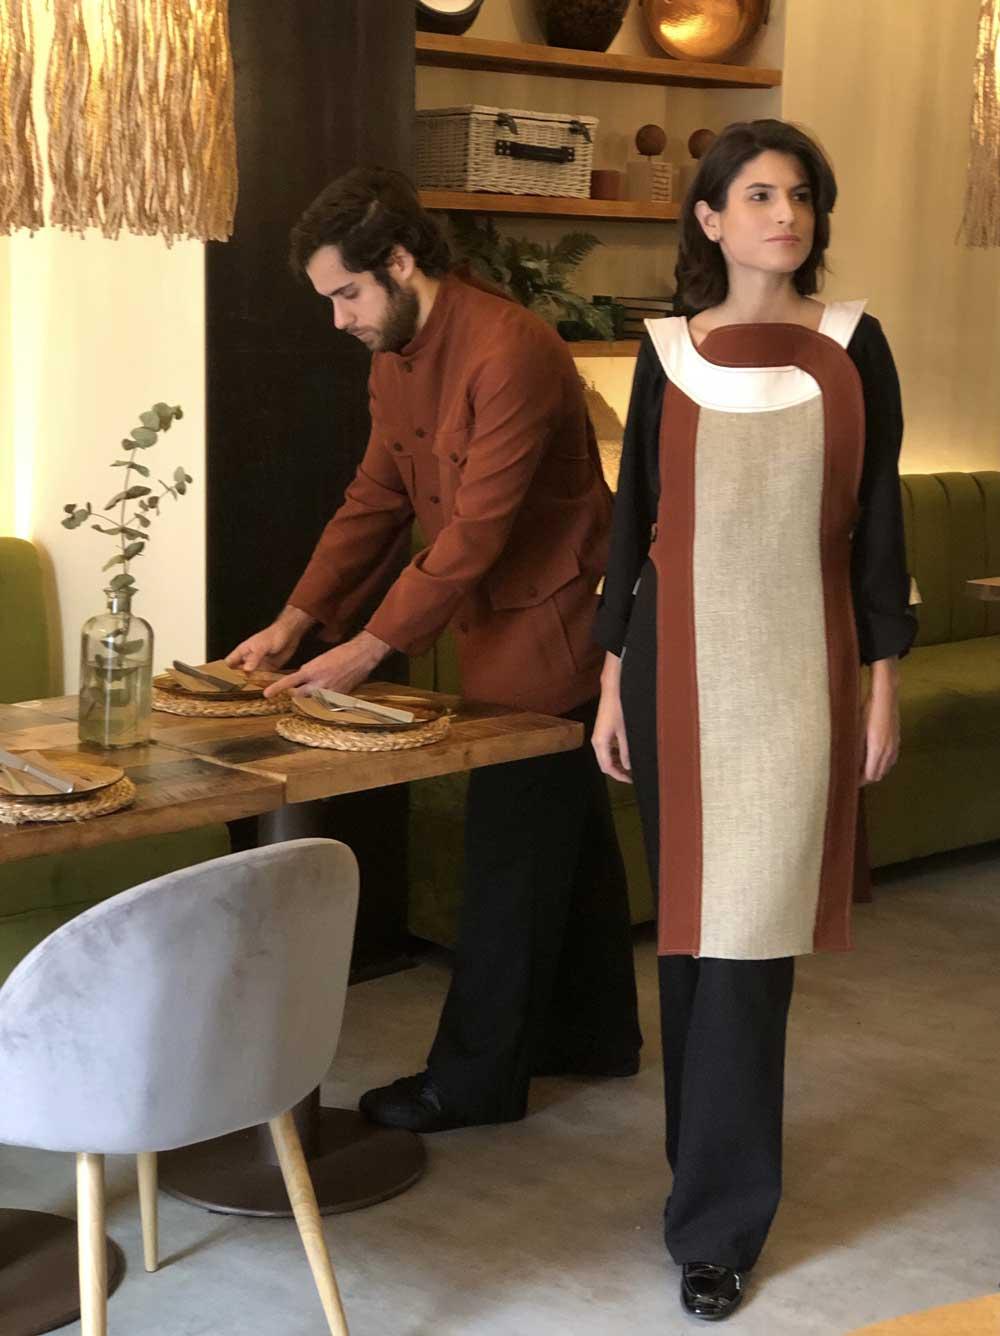 Vuelta al cole en la cocina con Maison Balmont